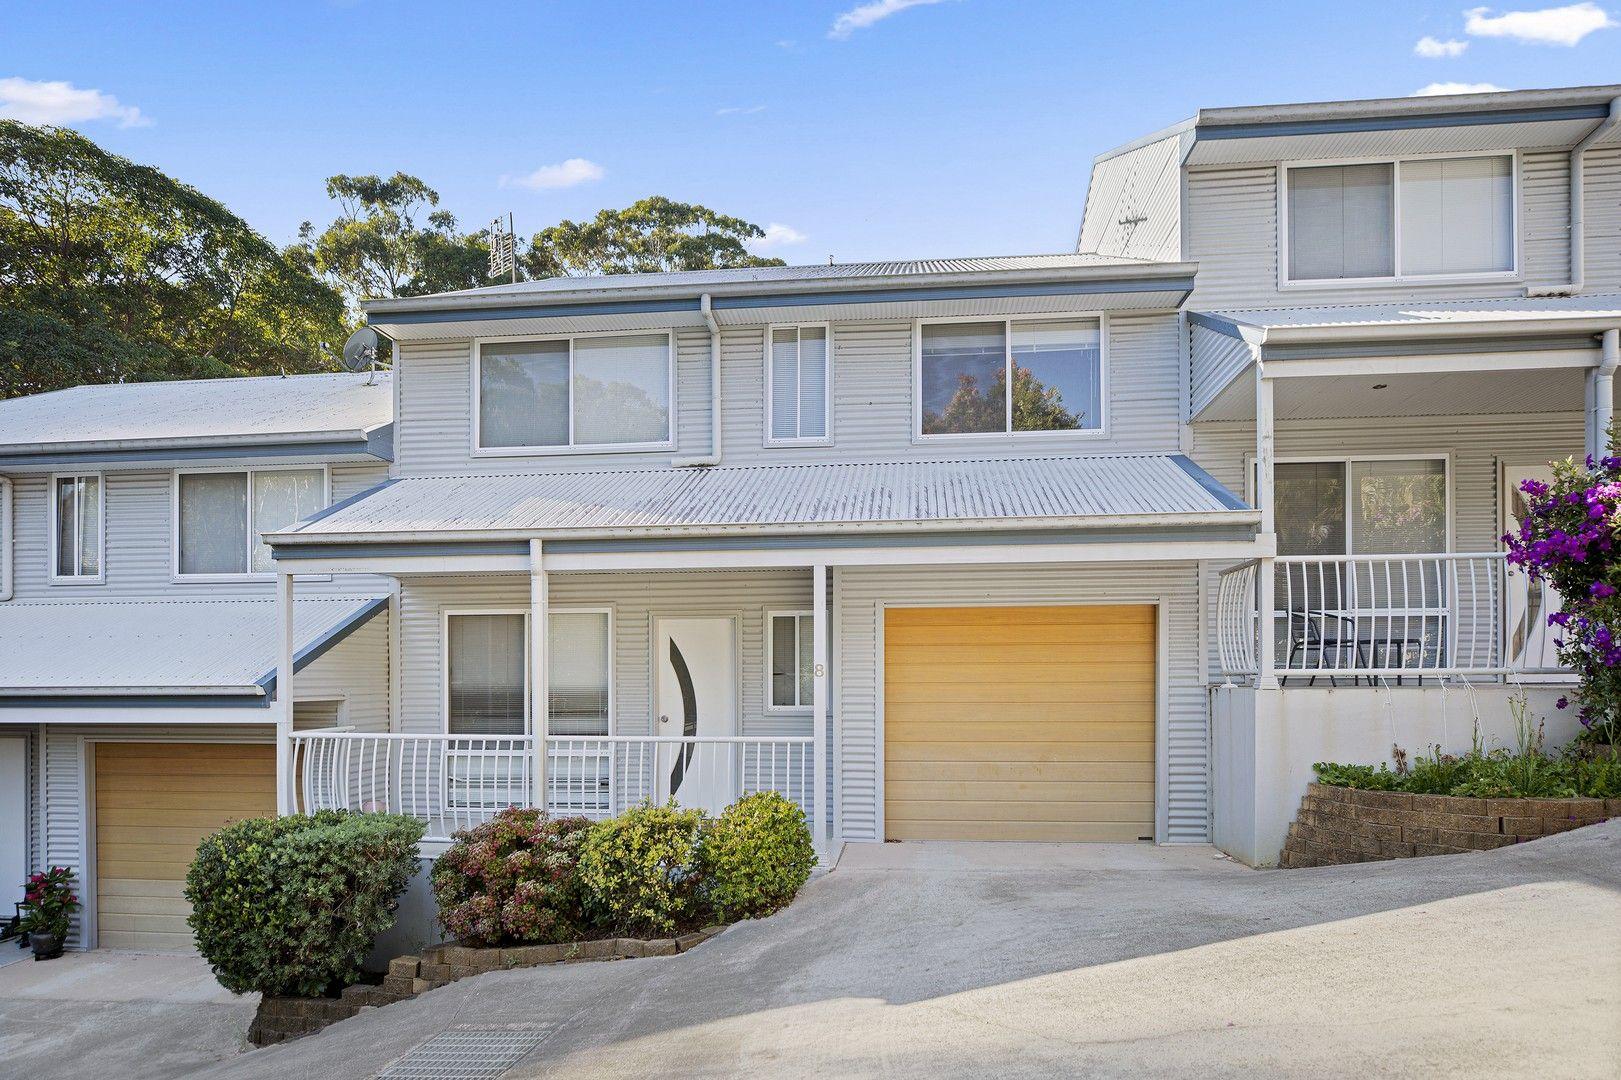 8/22 Parkes Street, Nambucca Heads NSW 2448, Image 0